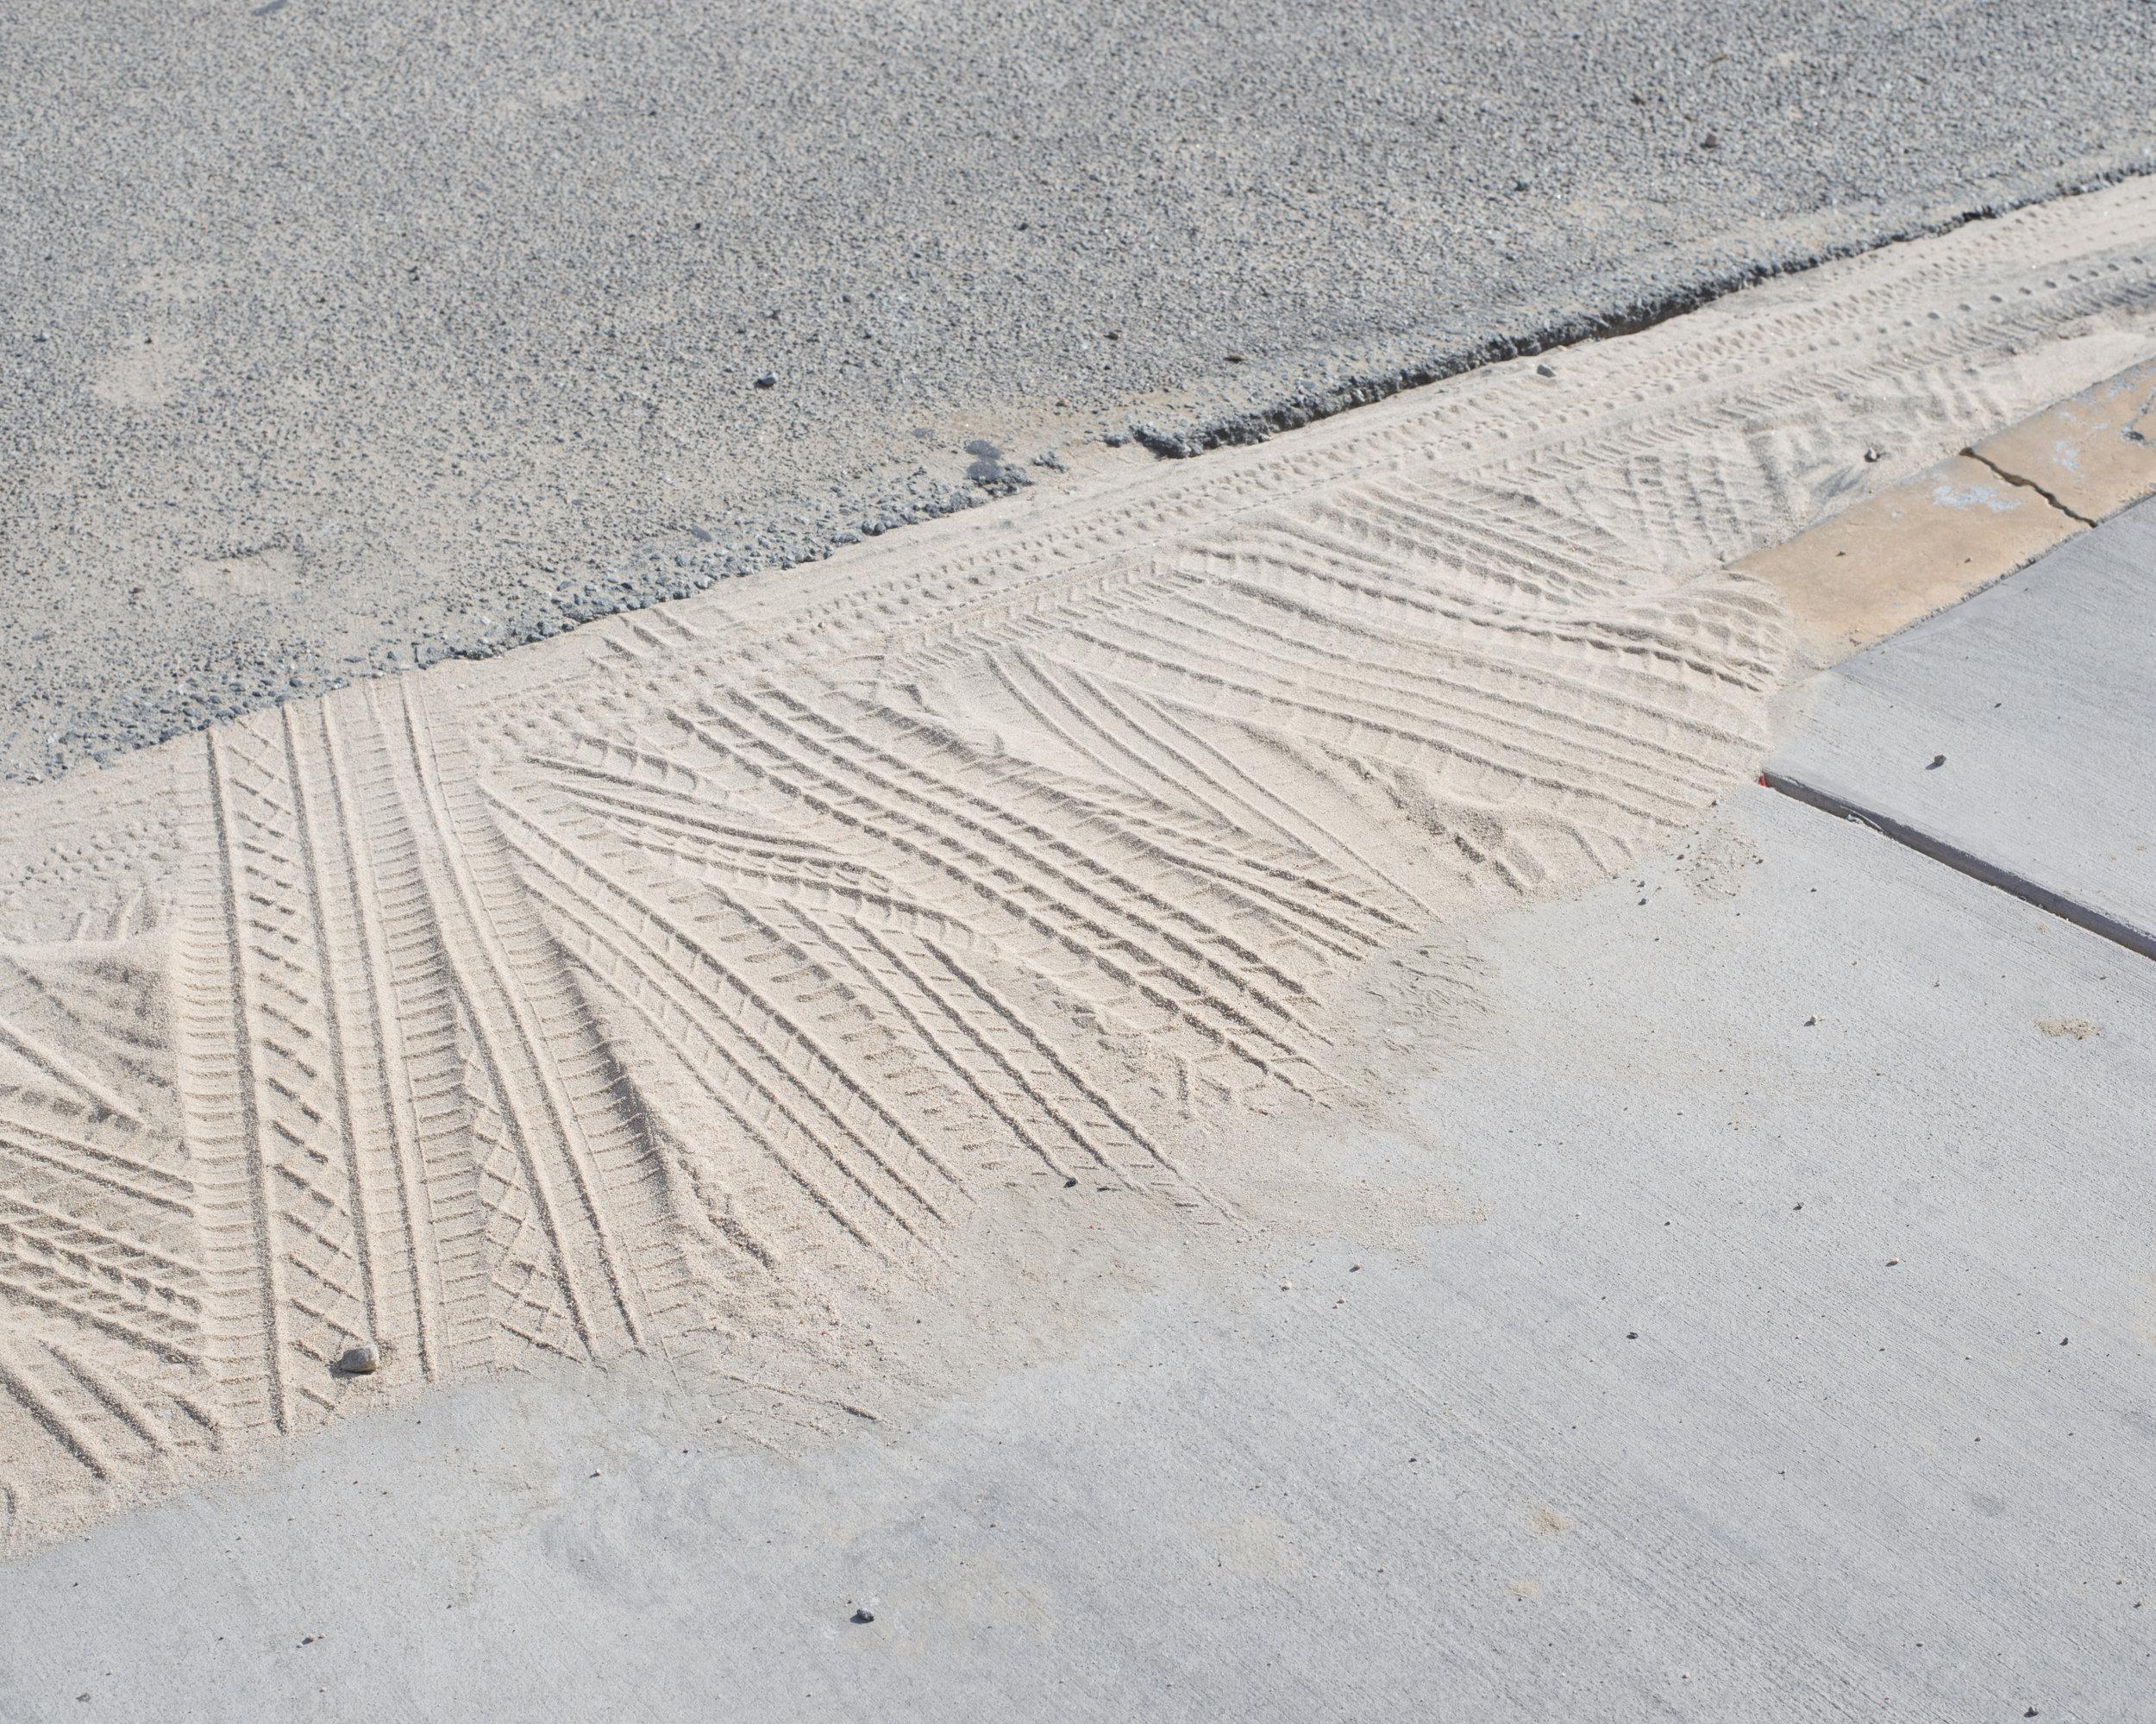 tire tracks on sand copy.jpg